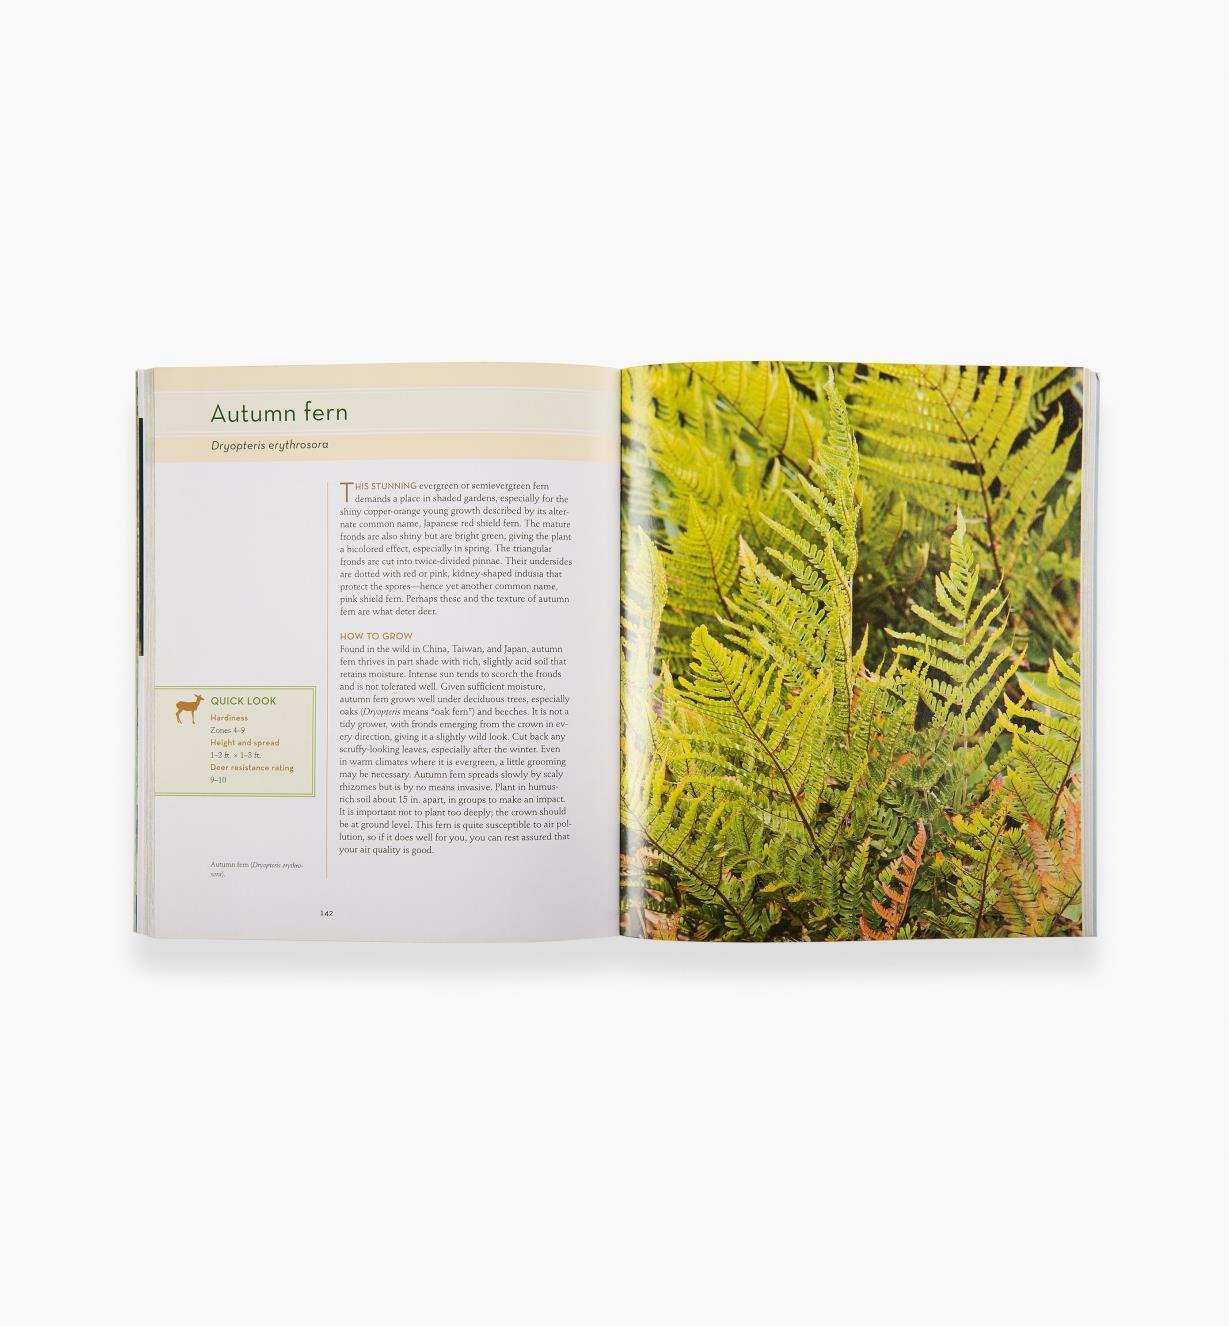 LA954 - 50 Beautiful Deer-Resistant Plants